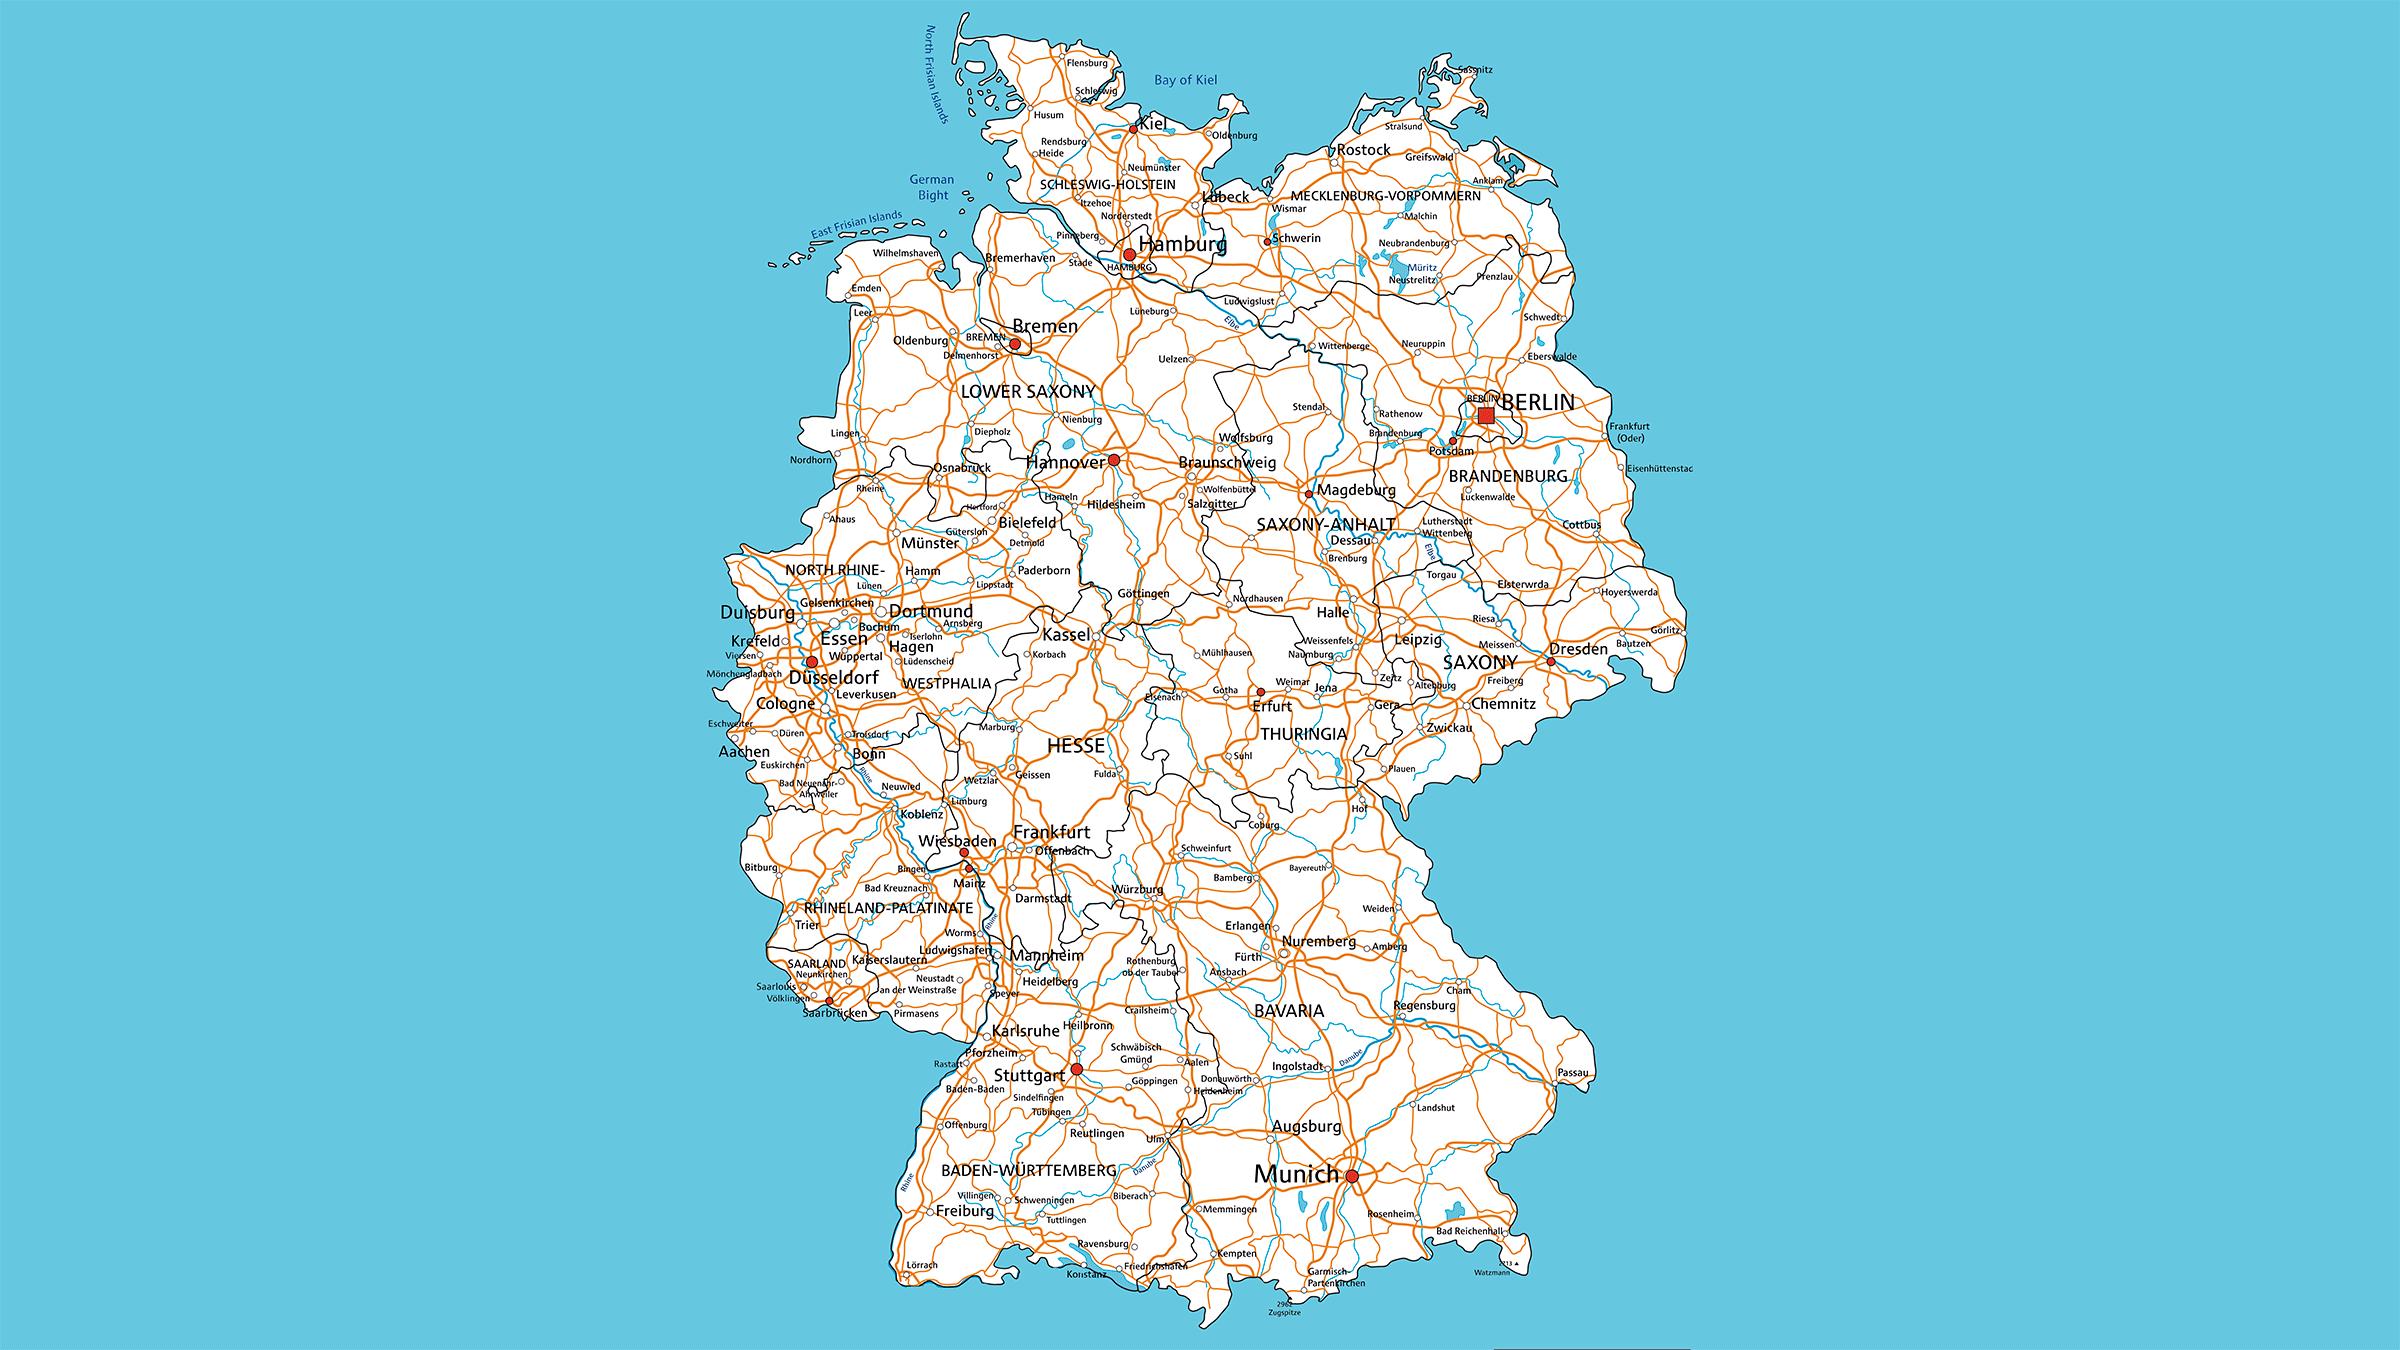 Mapa carretera de Alemania